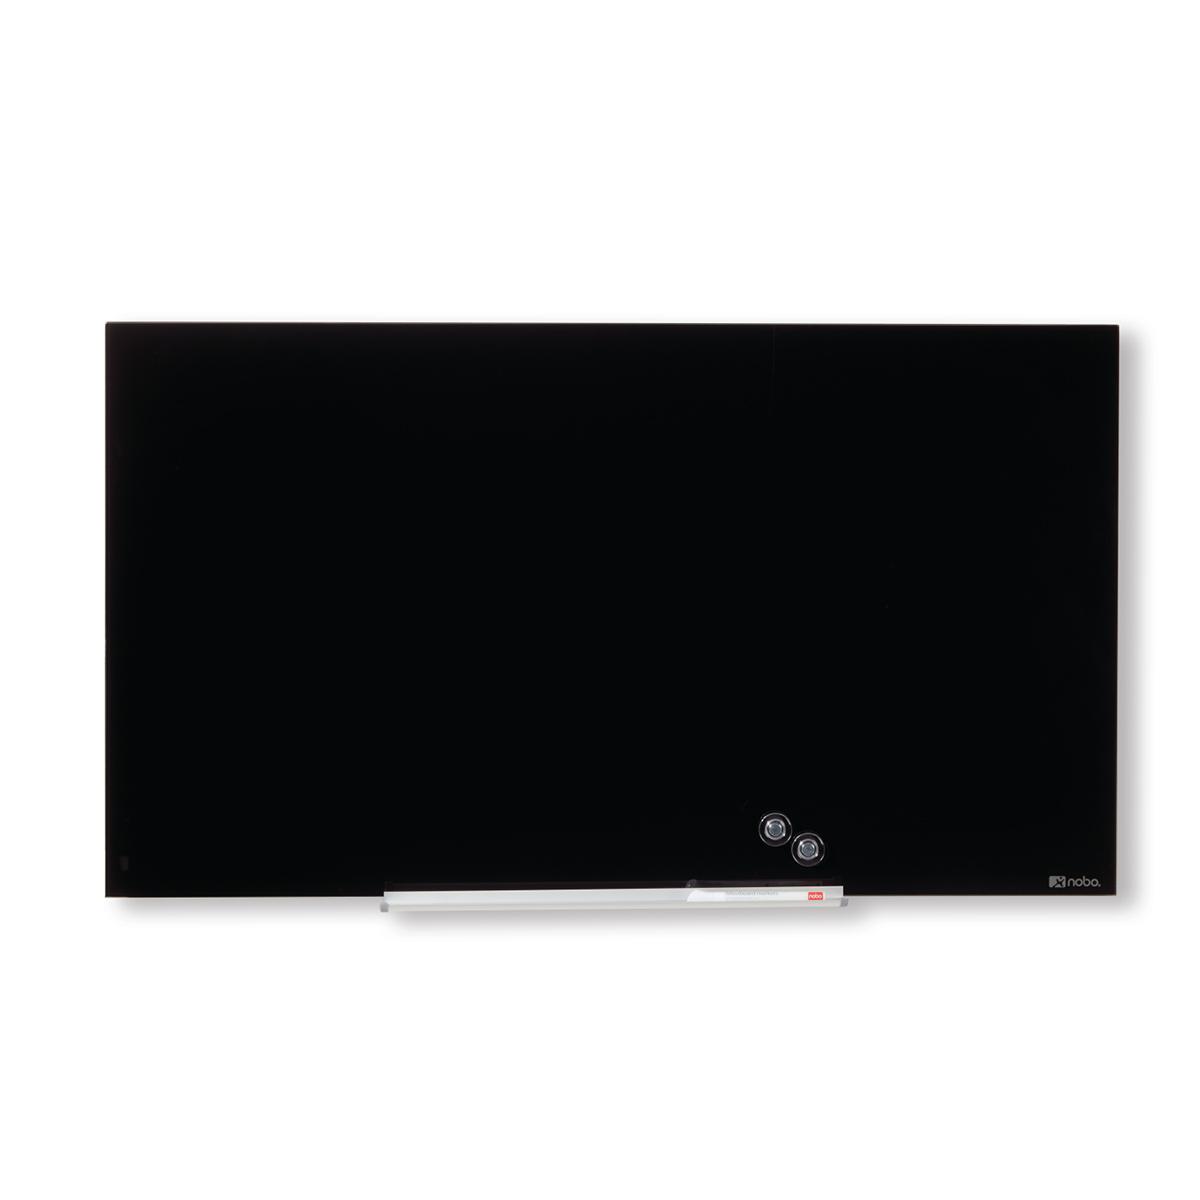 Nobo 1905179 Black Diamond Glass Whiteboard 667 x 381mm